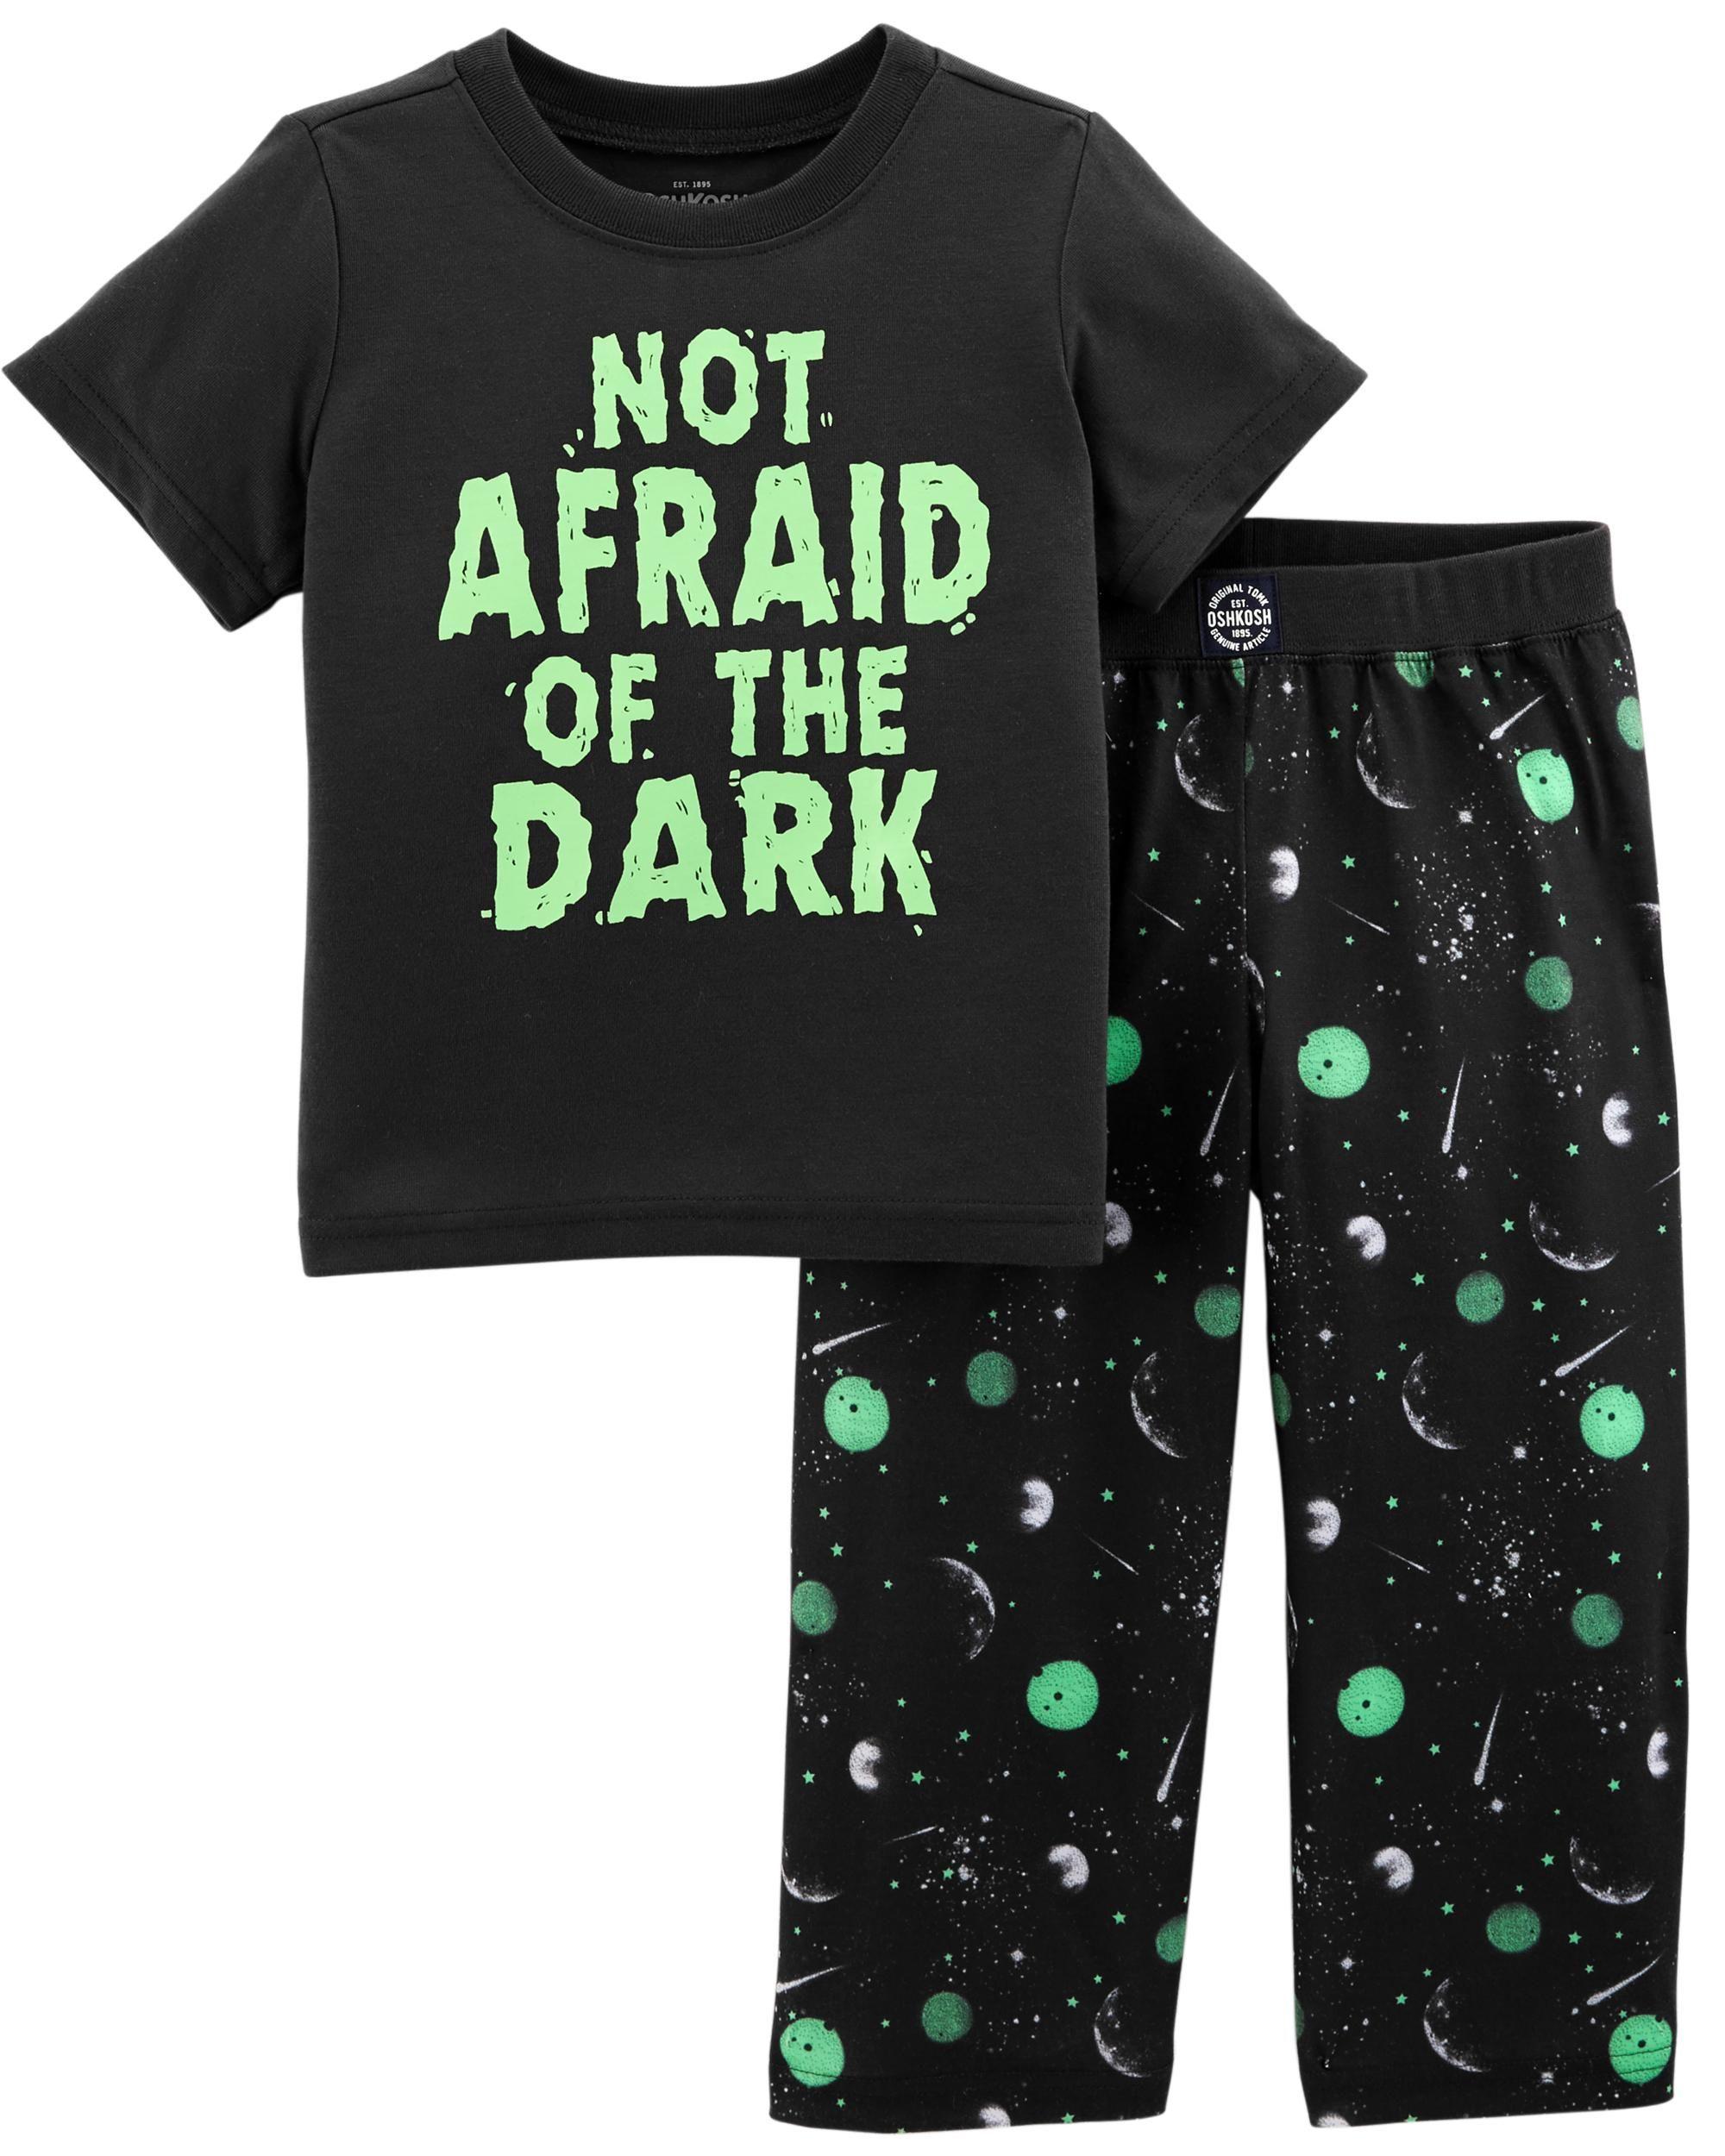 84a9c4a1a 2-Piece Glow-in-the-Dark PJs